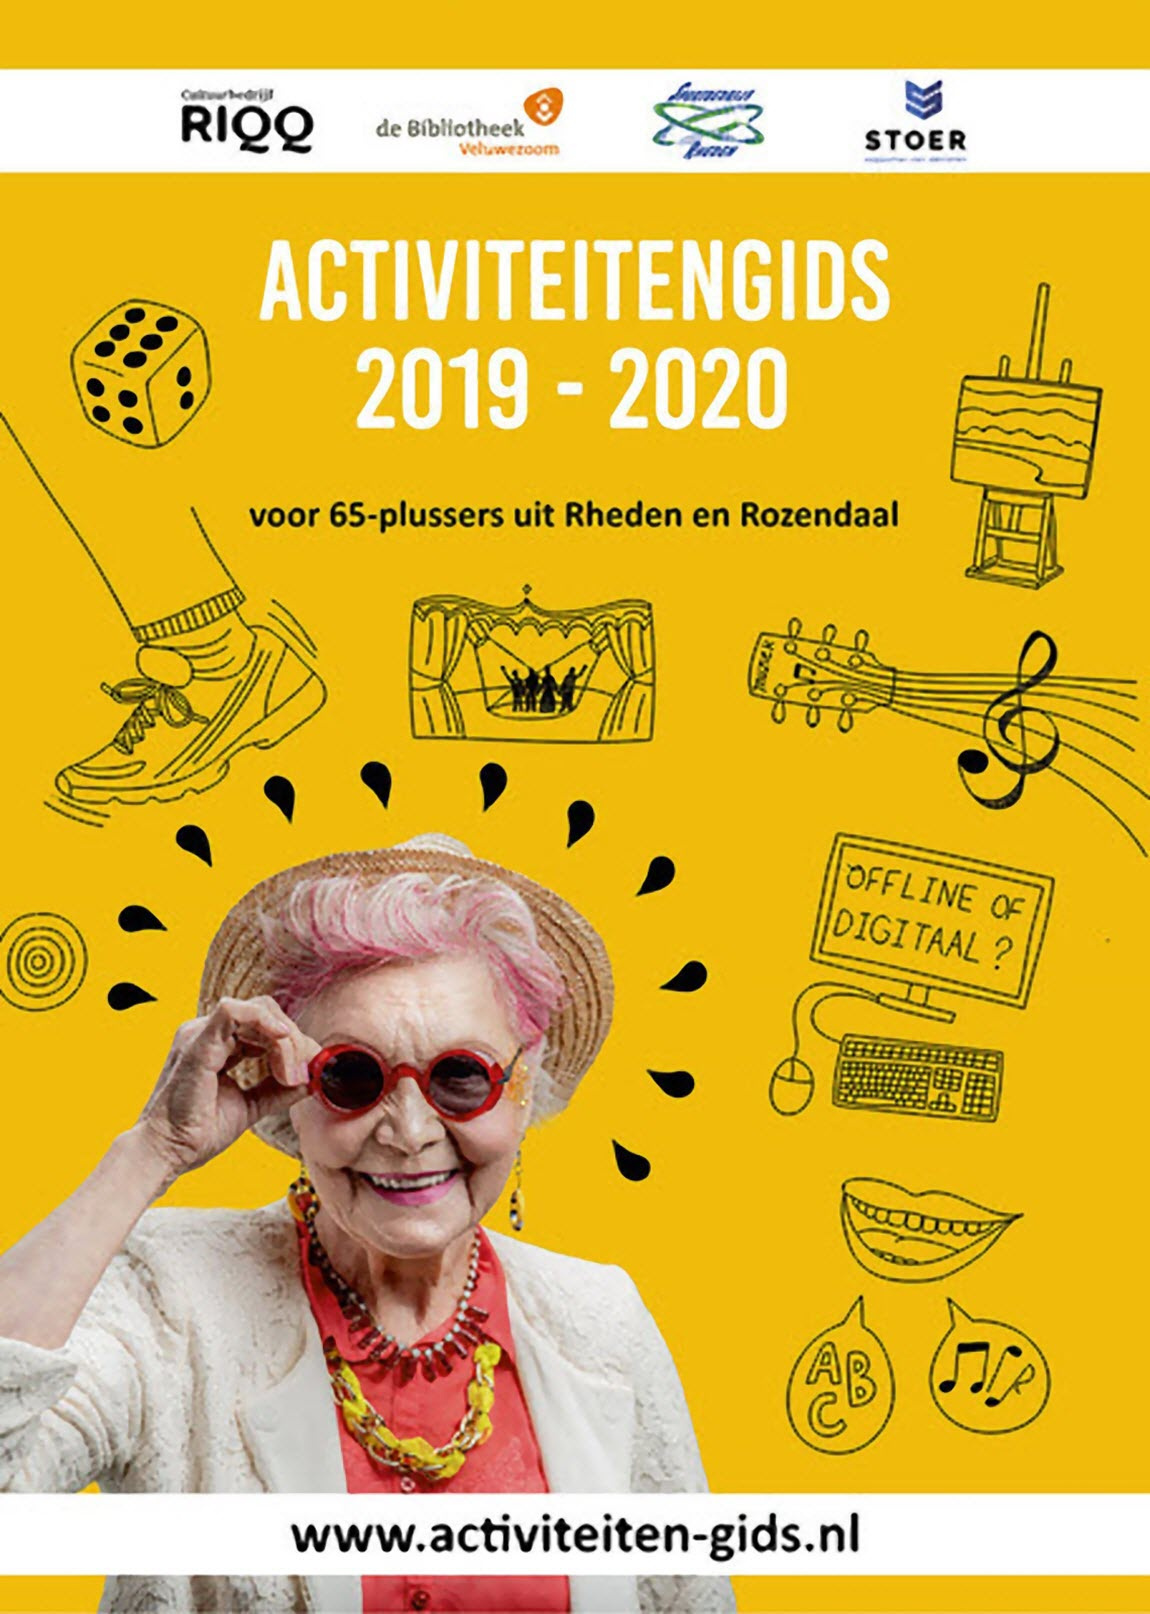 Activiteitengids 2019-2020